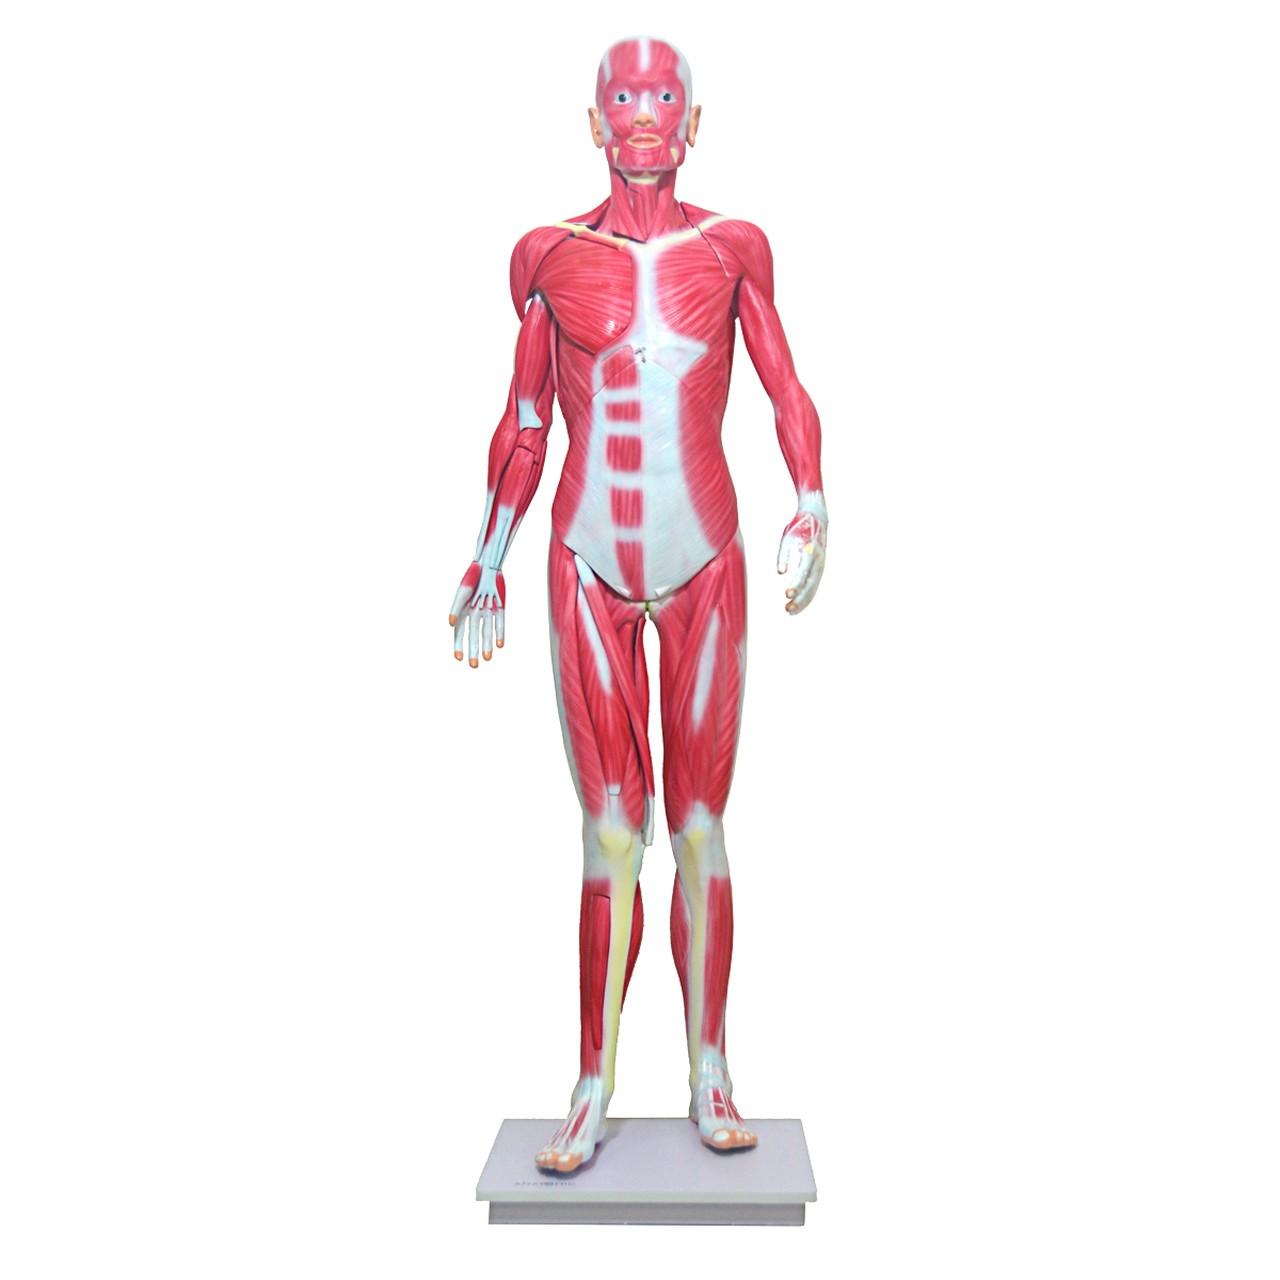 Manequim Muscular de 170cm, Assexuado, em 33 Partes